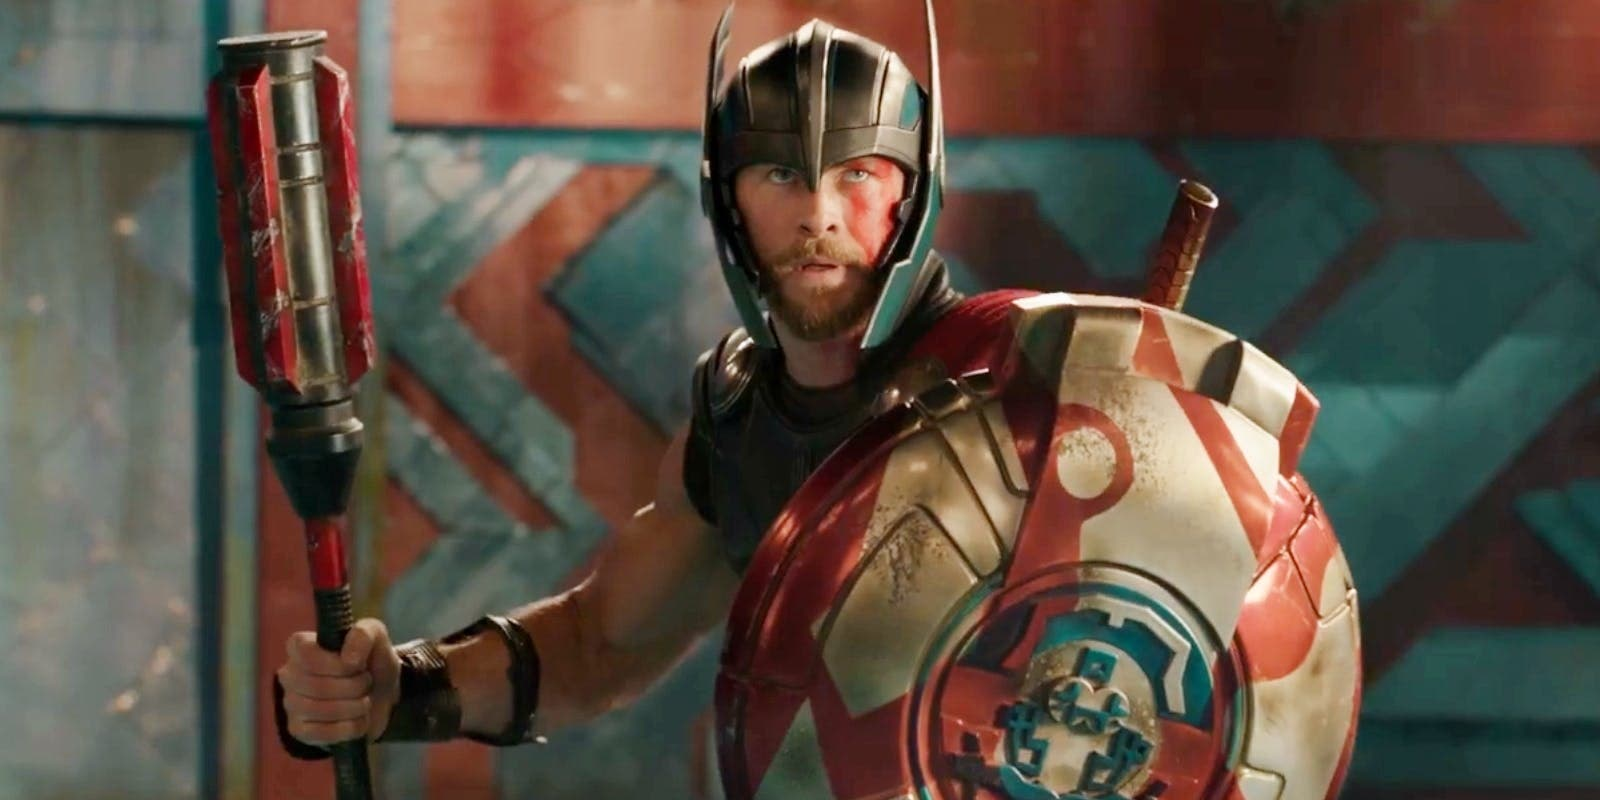 Escena eliminada de Thor: Ragnarok